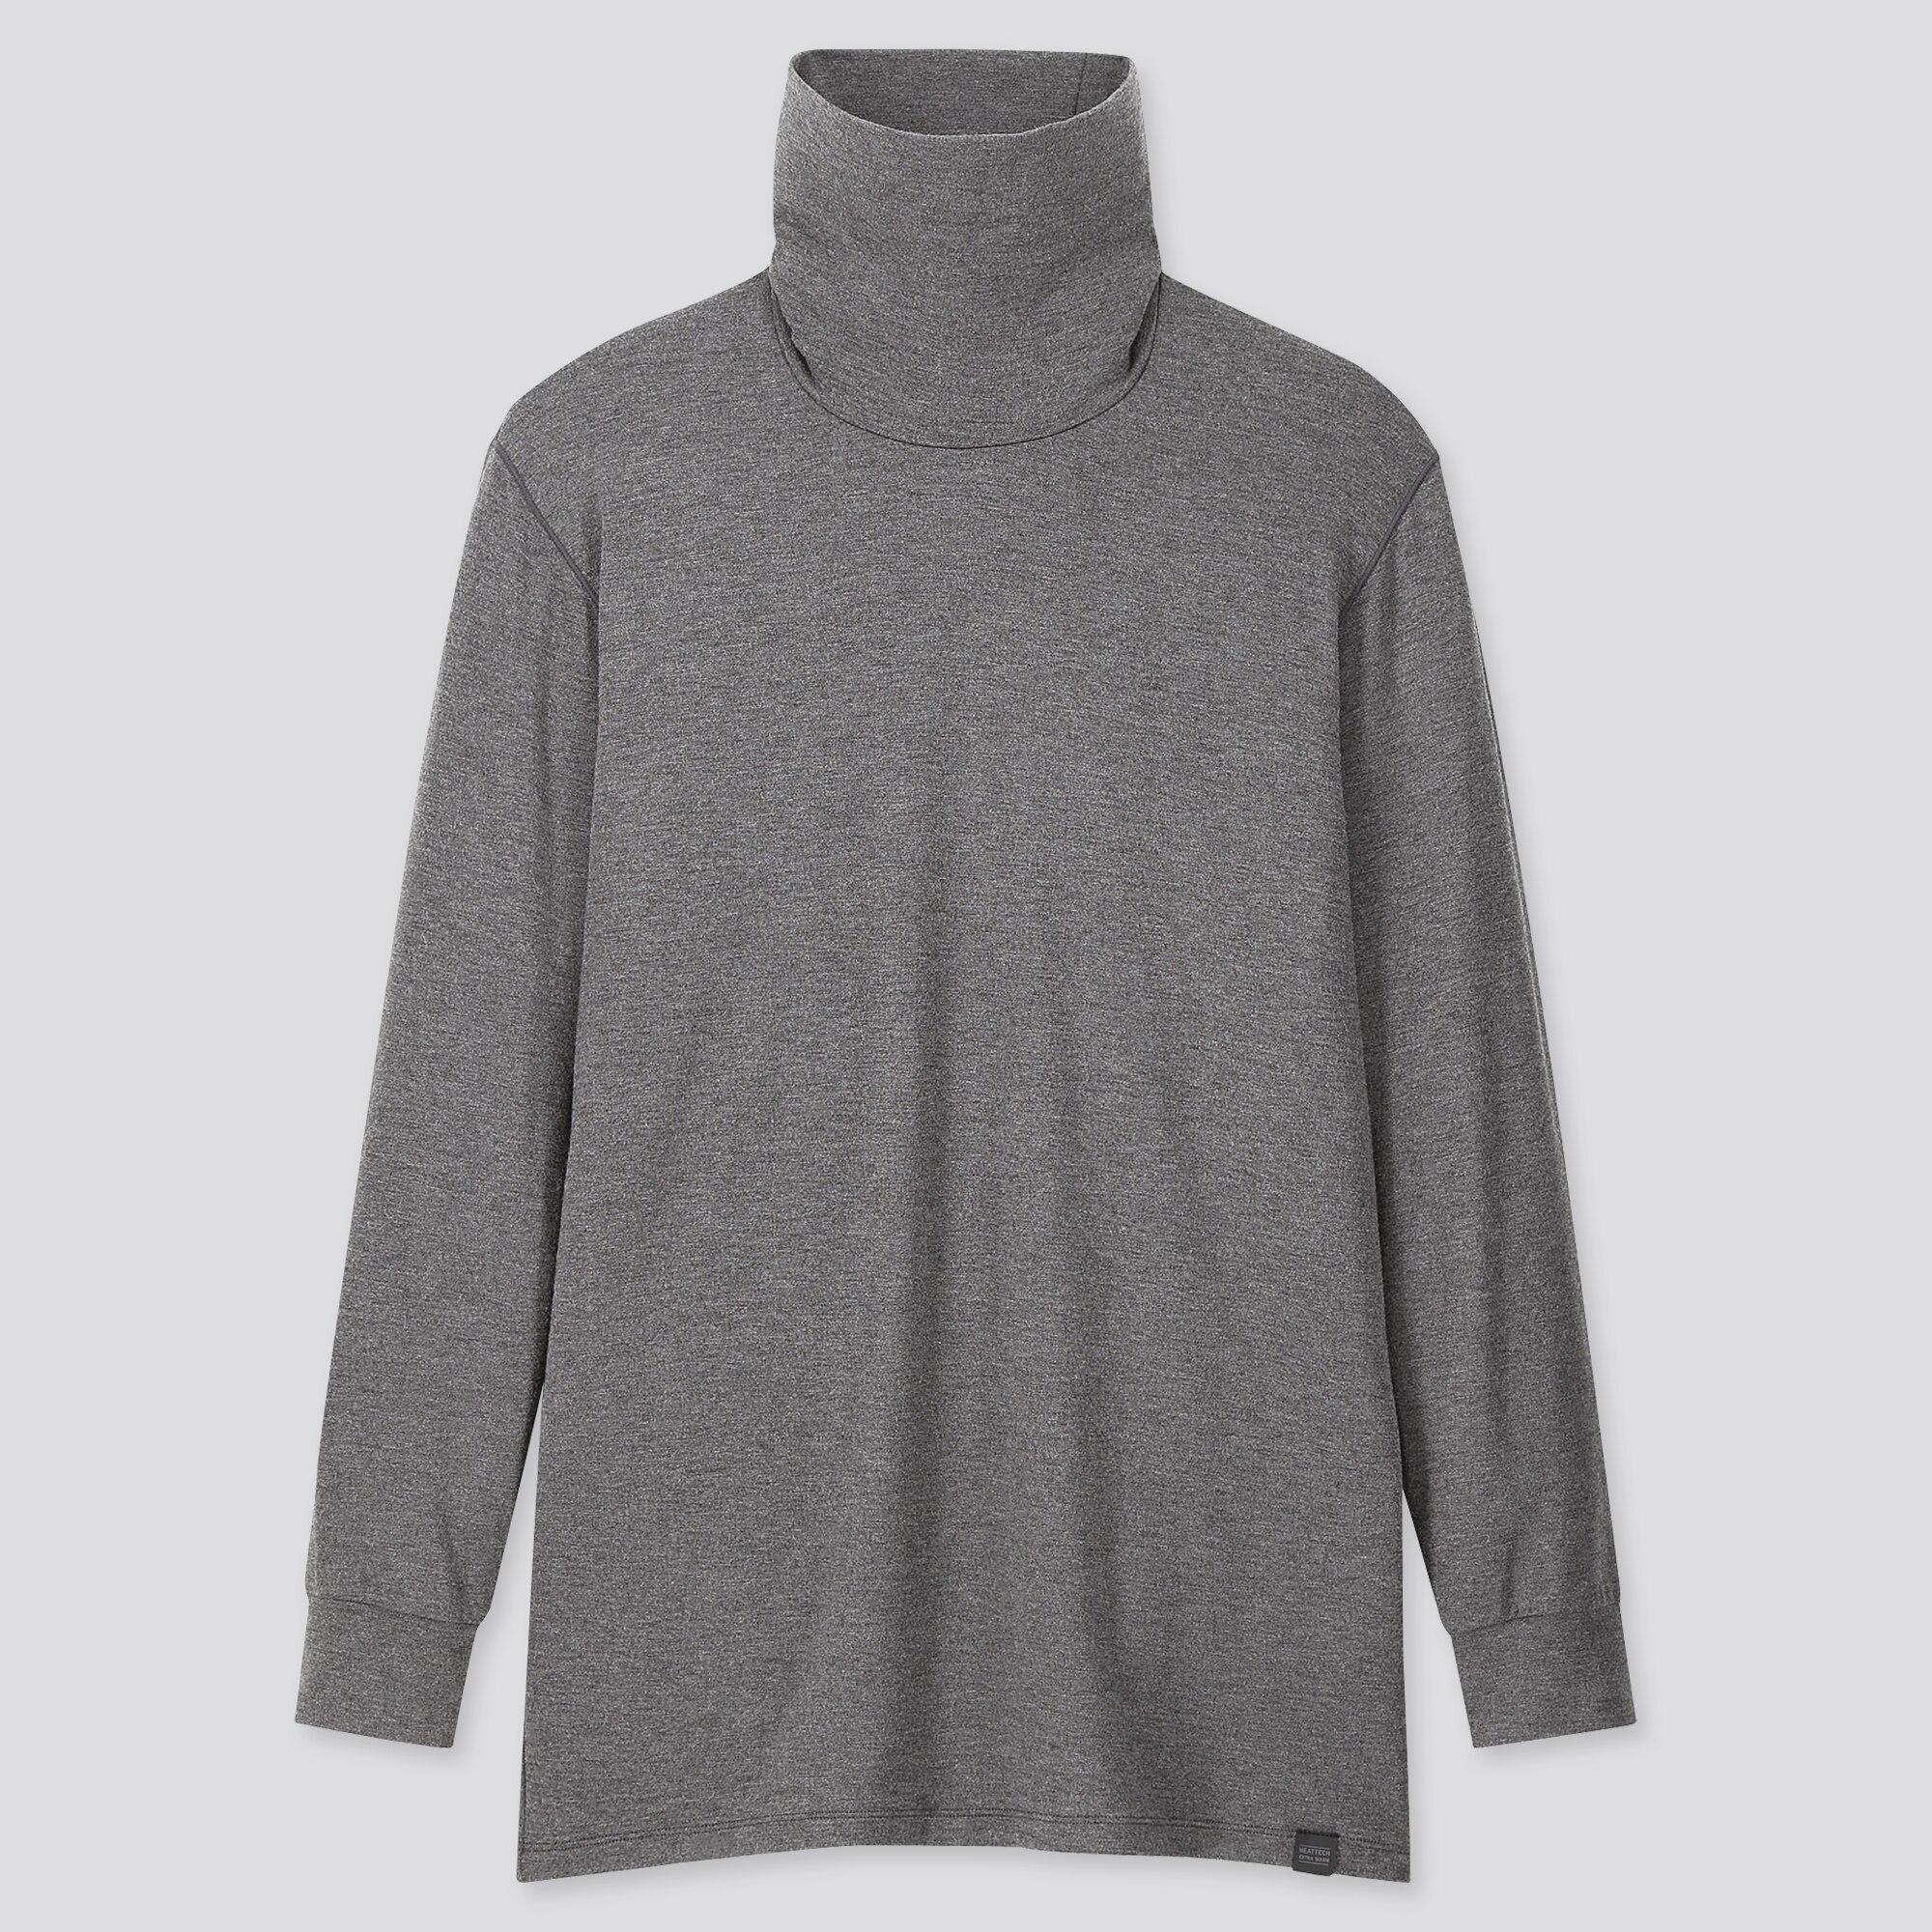 Uniqlo Uniqlo men heattech extra warm turtleneck long-sleeve t-shirt